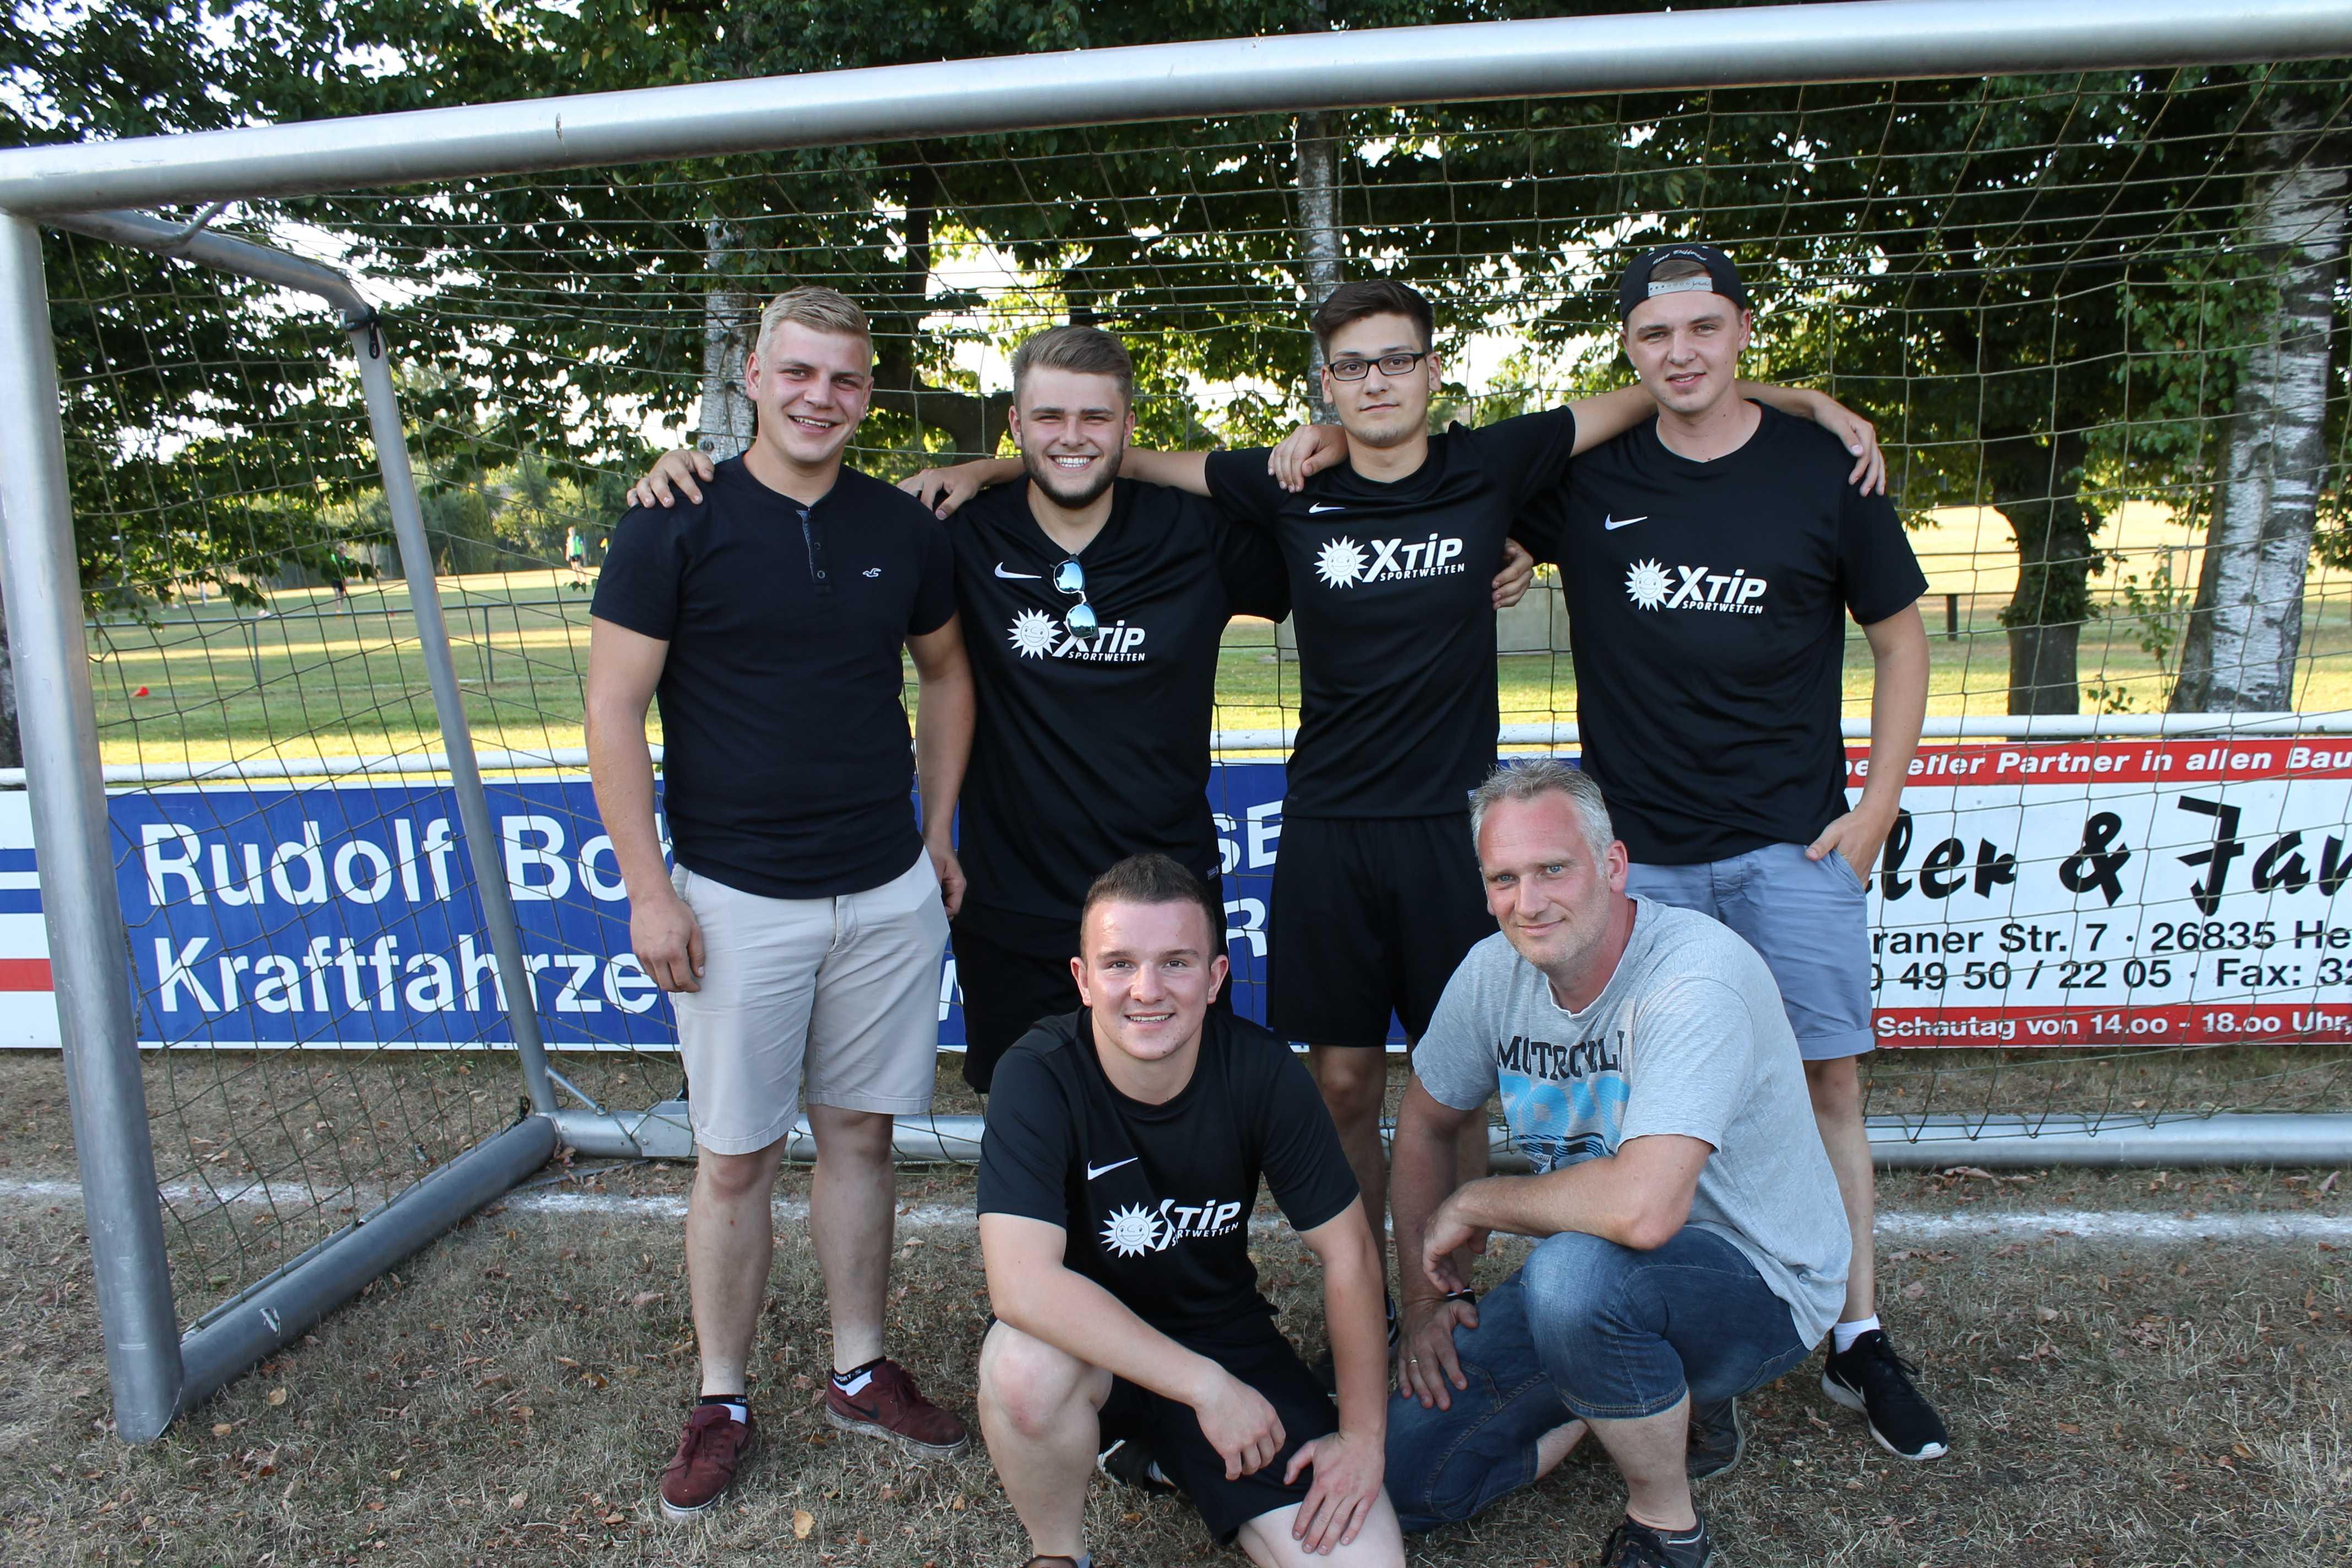 2018-07-27 Sportwoche - Flunkyball Turnier (34)